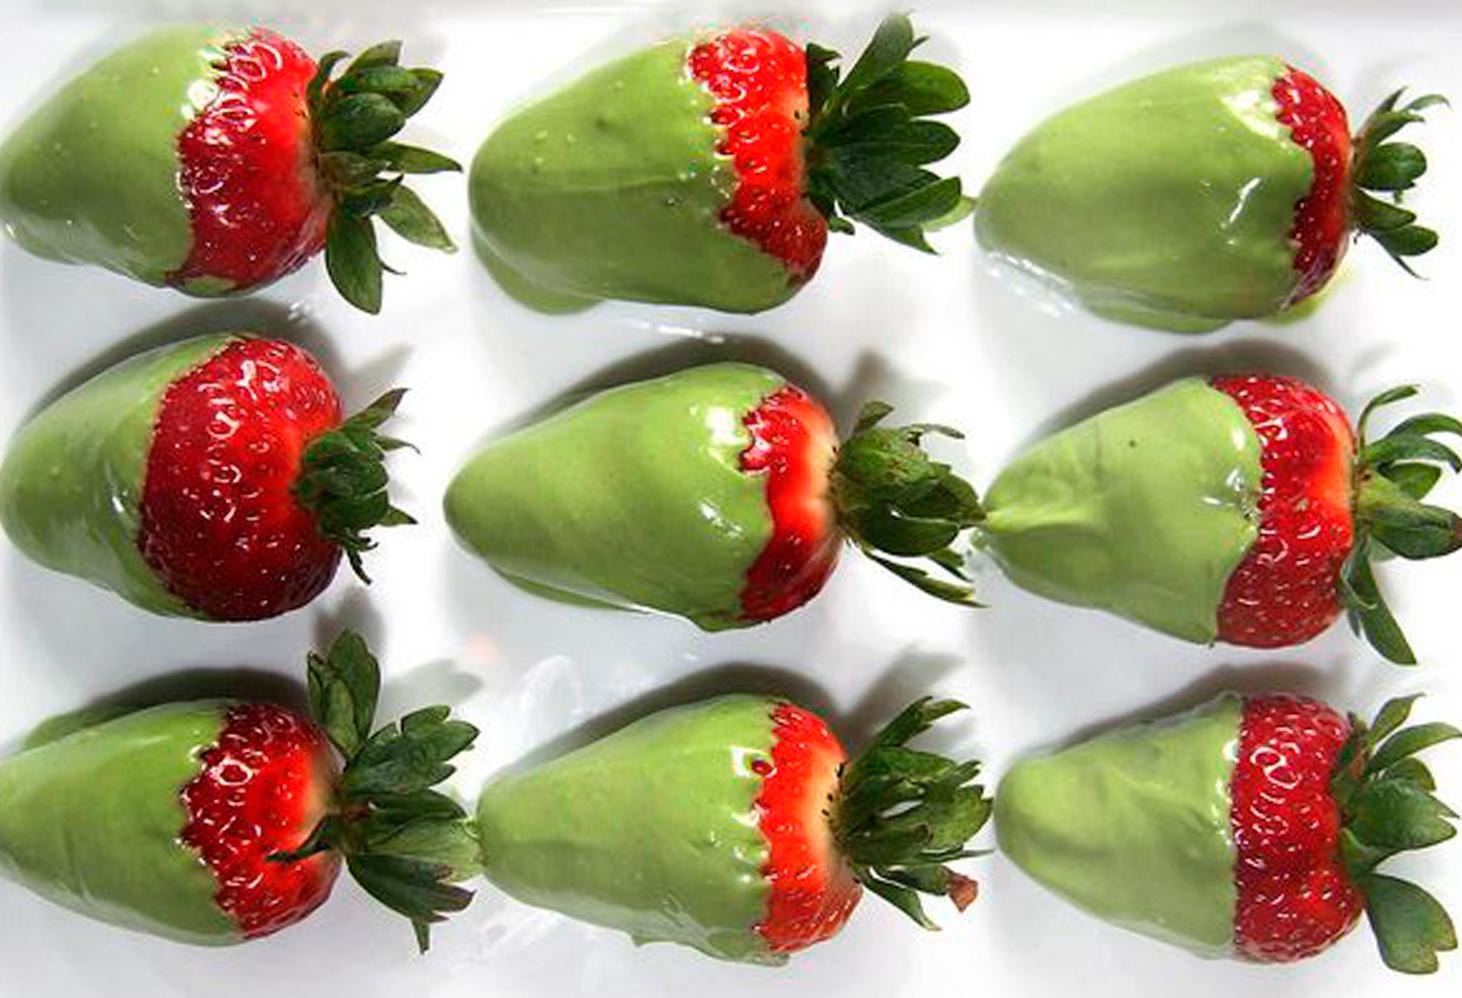 Strawberries with matcha tea chocolate 1